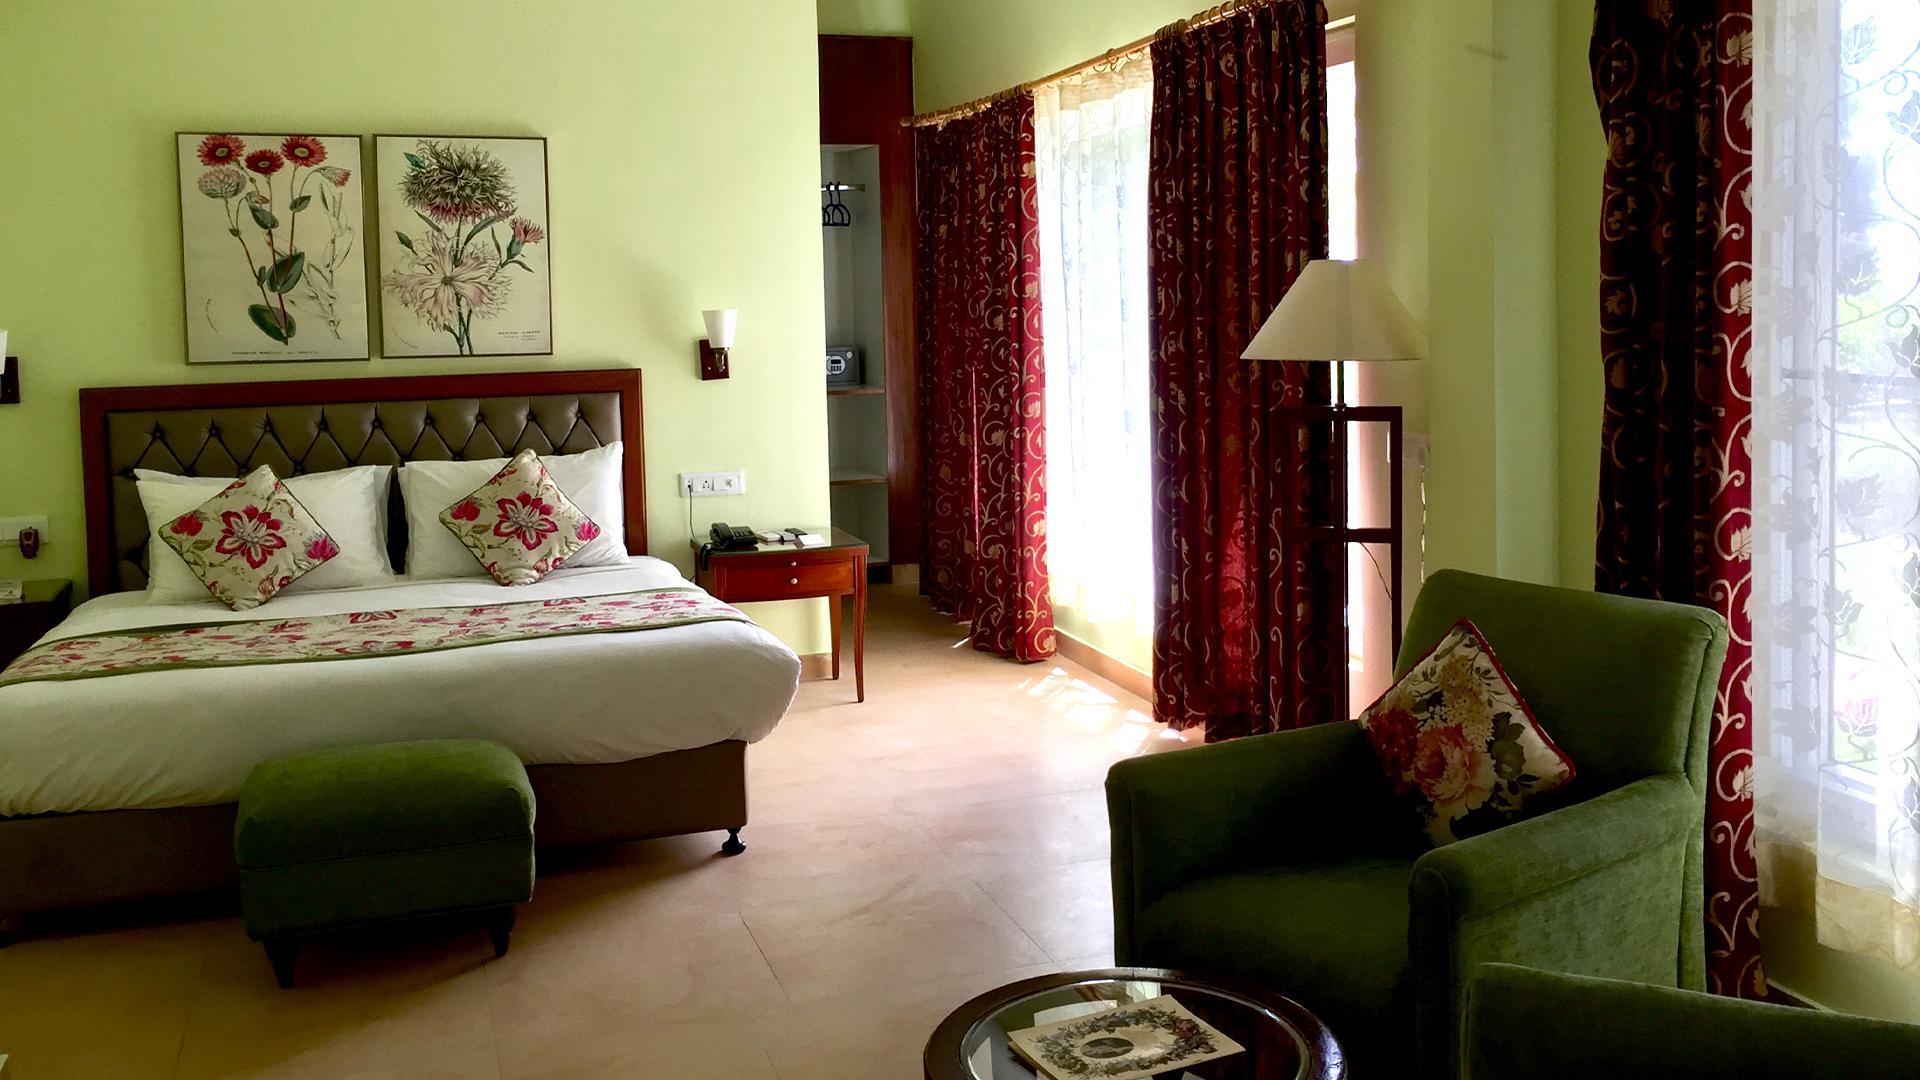 Garden Villa Suite image 1 at WelcomHeritage Kasmanda Palace Mussoorie by Dehradun, Uttarakhand, India